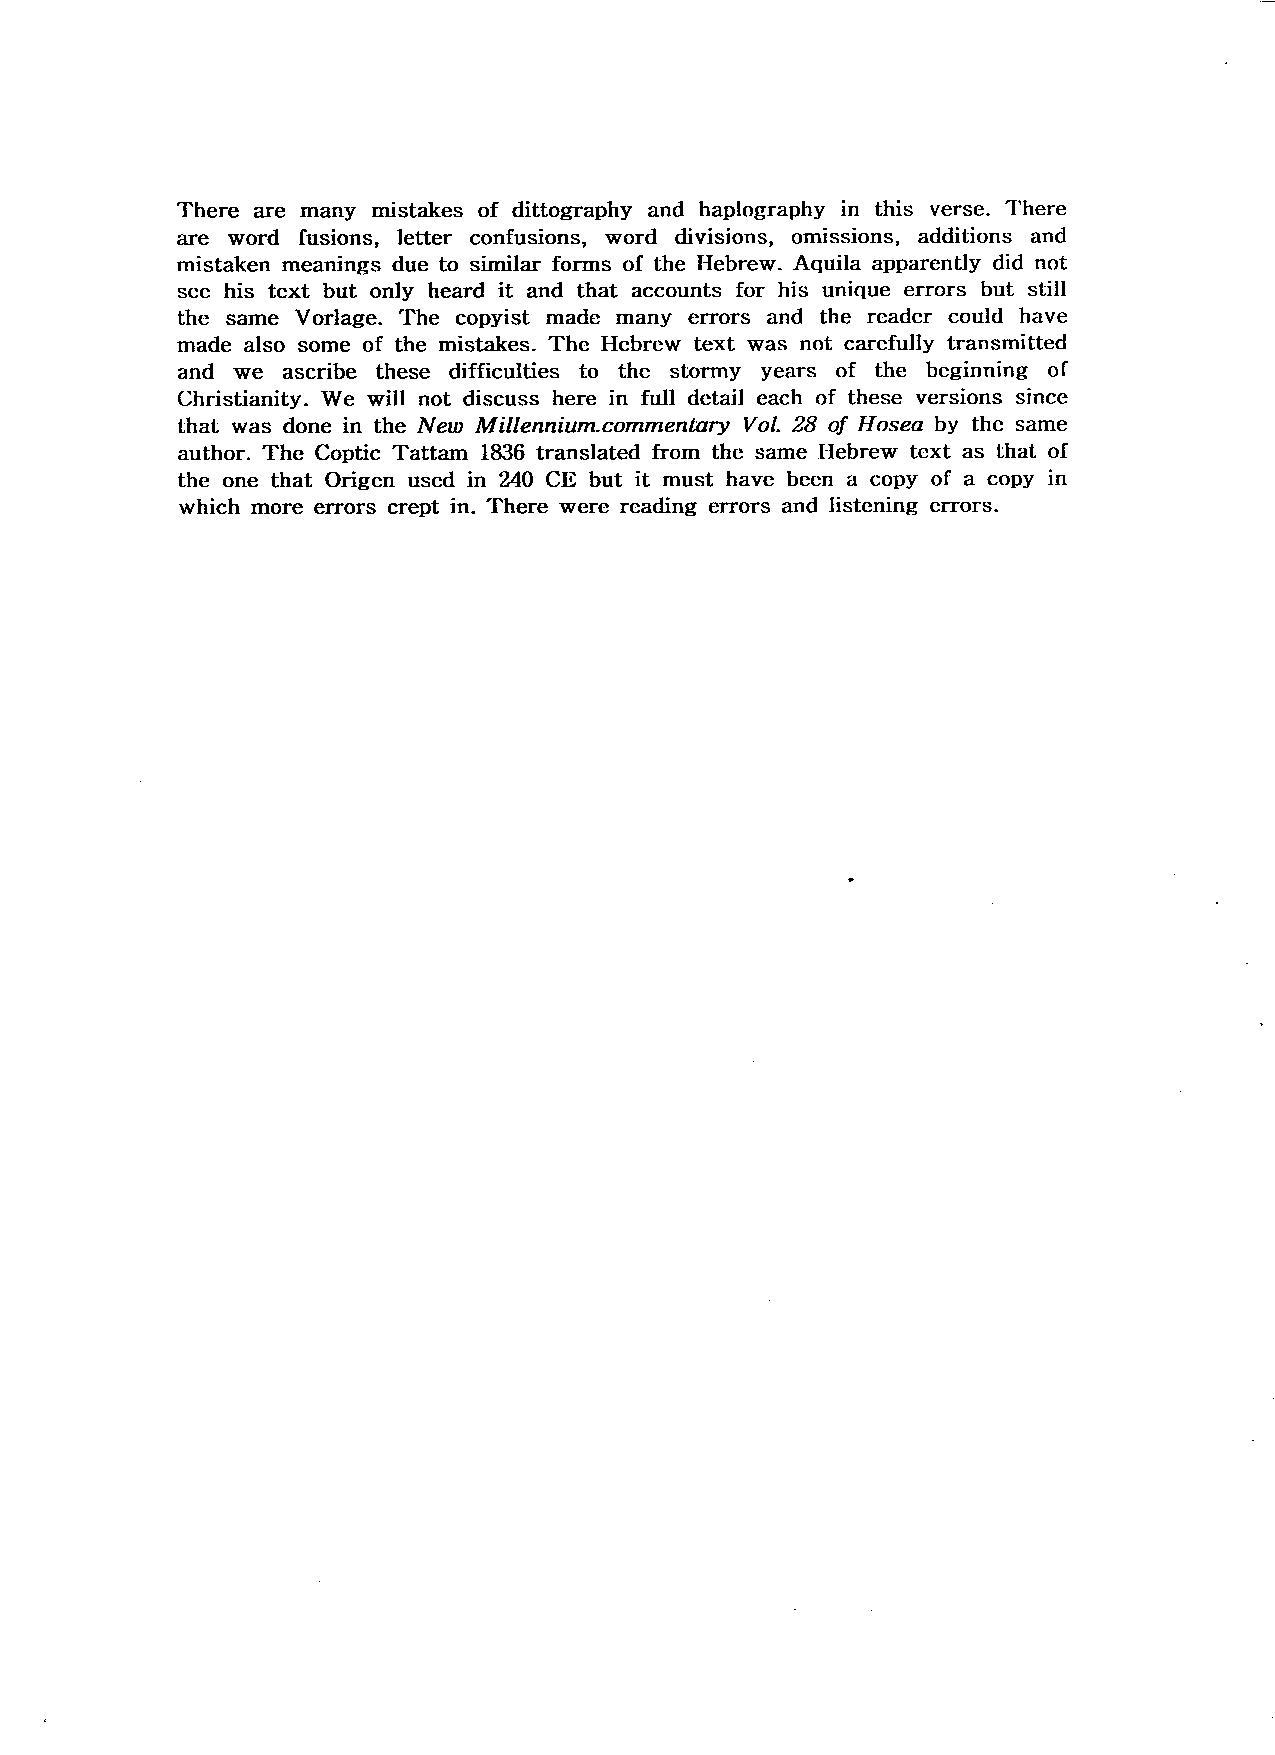 coptic of hosea in english 4f.jpg